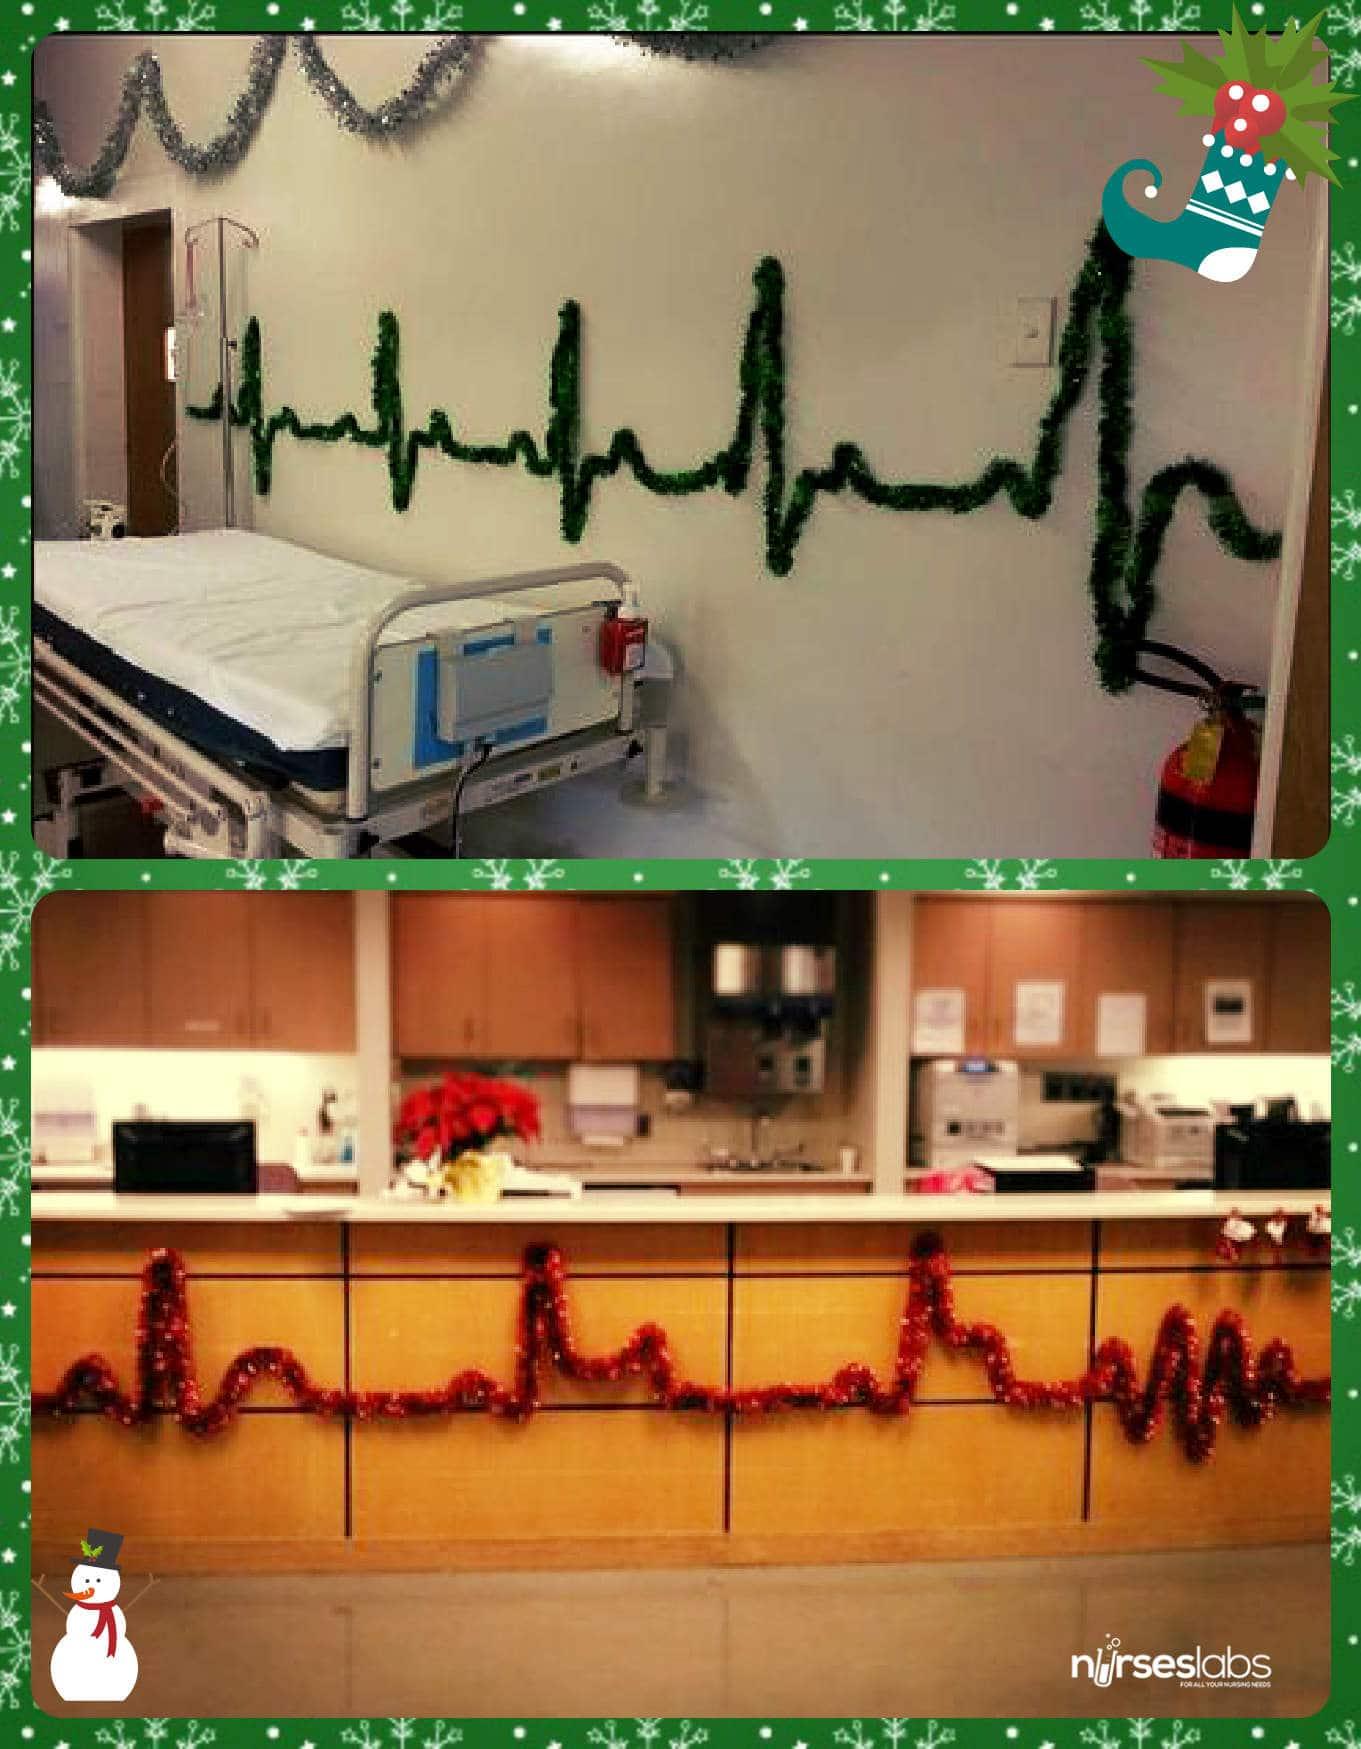 Nursing Garlands 1